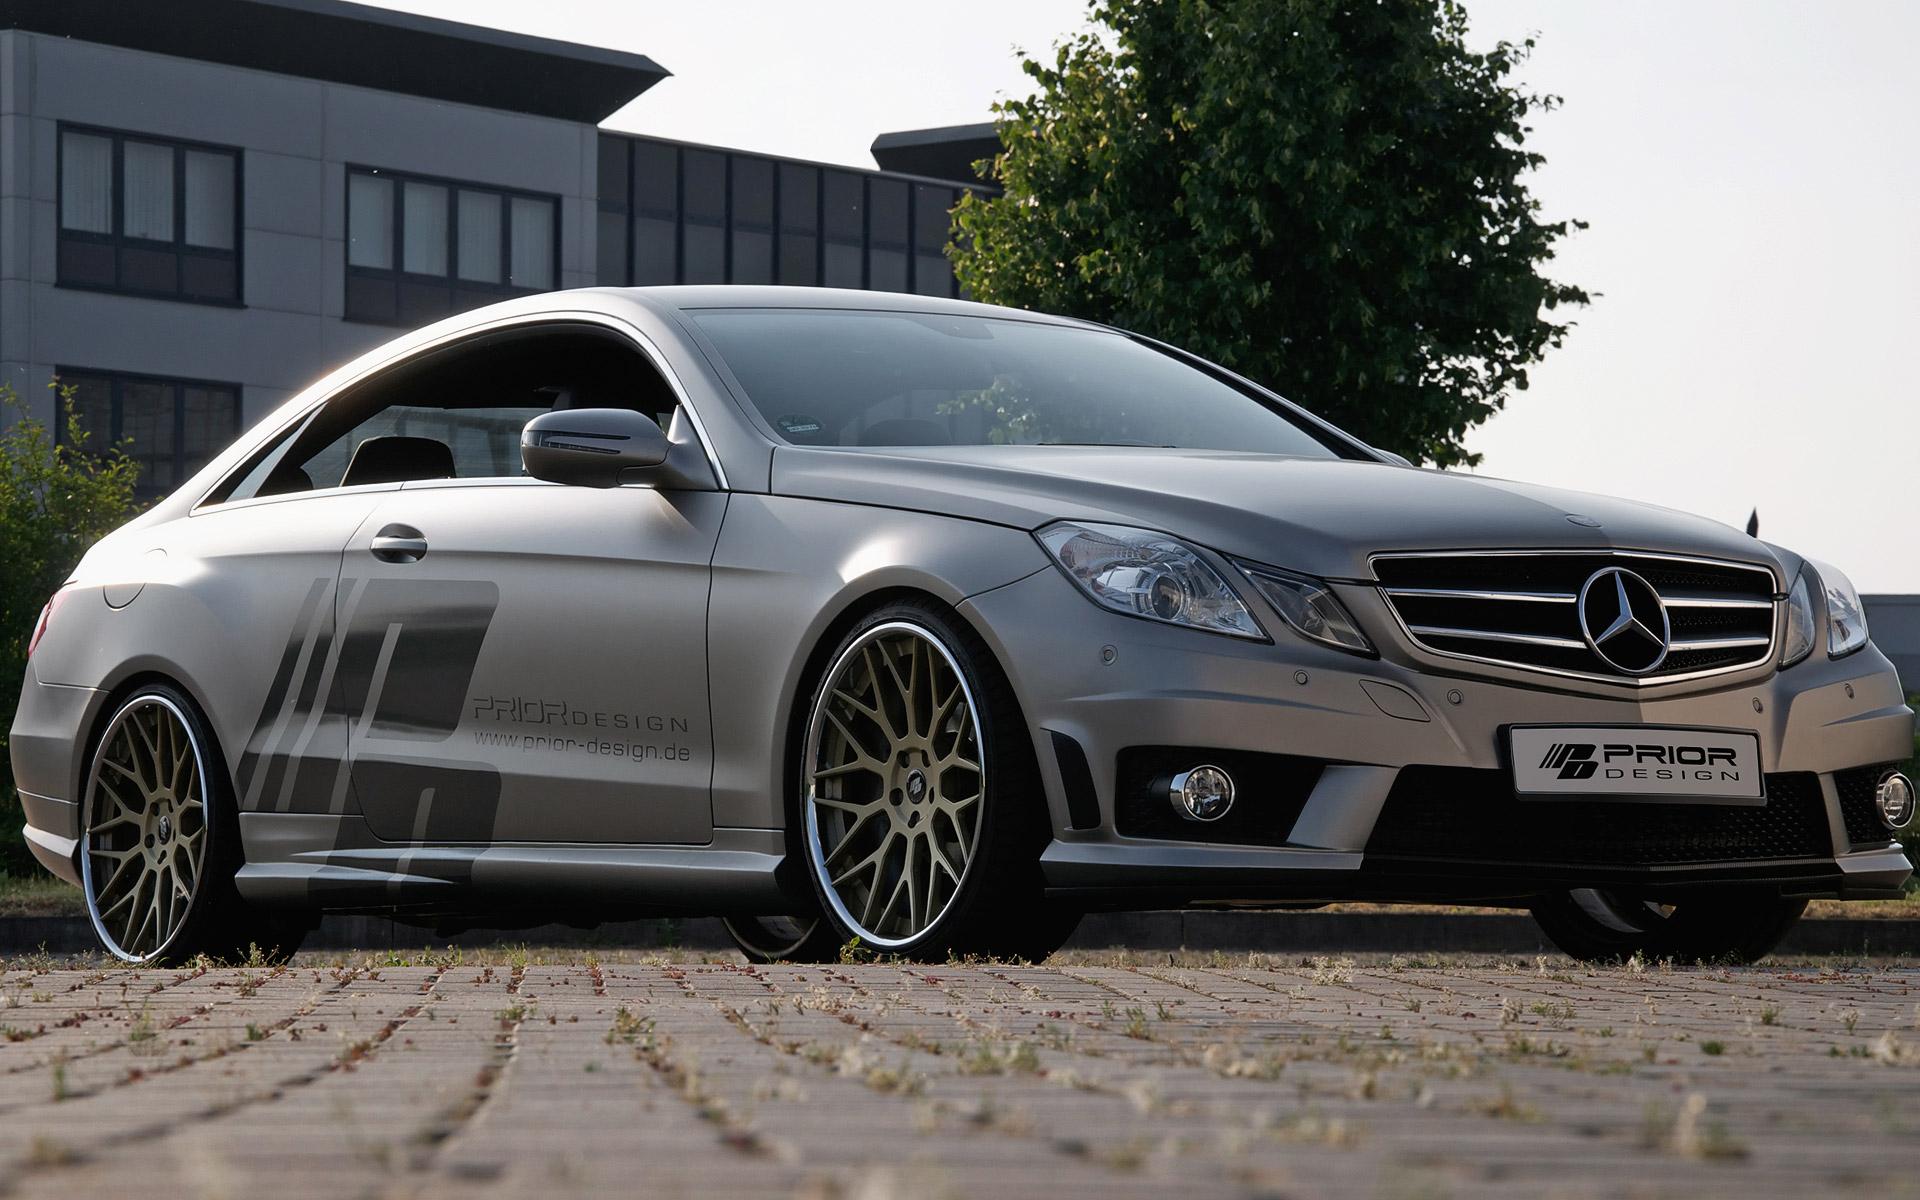 Prior design mercedes benz e class c207 with enhanced for Mercedes benz design